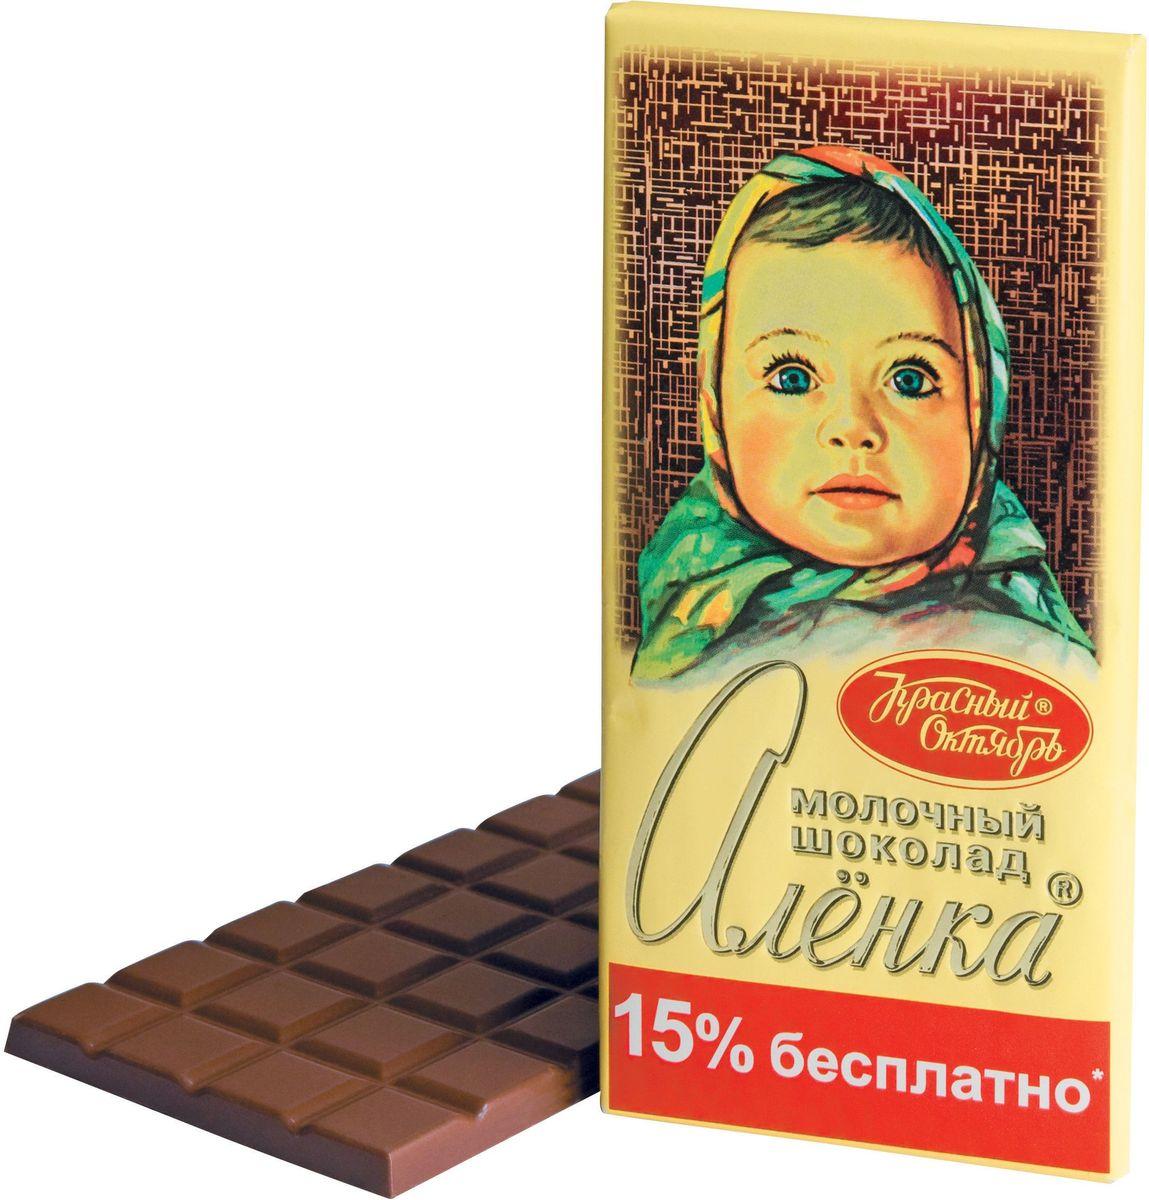 Красный Октябрь Аленка молочный шоколад, 200 г